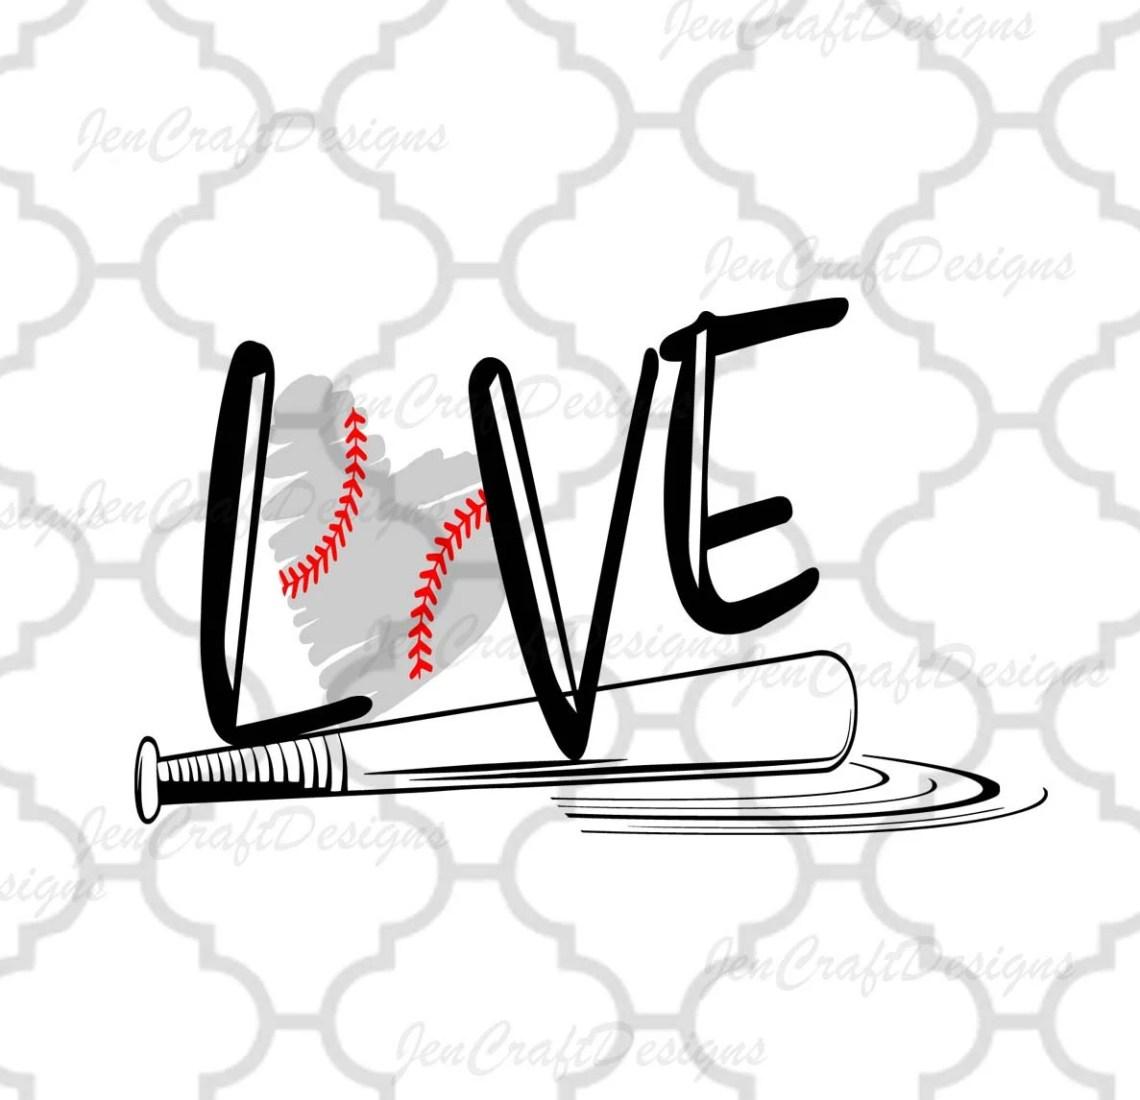 Download Baseball SVG, Basbeball love svg design, Softball baseball ...